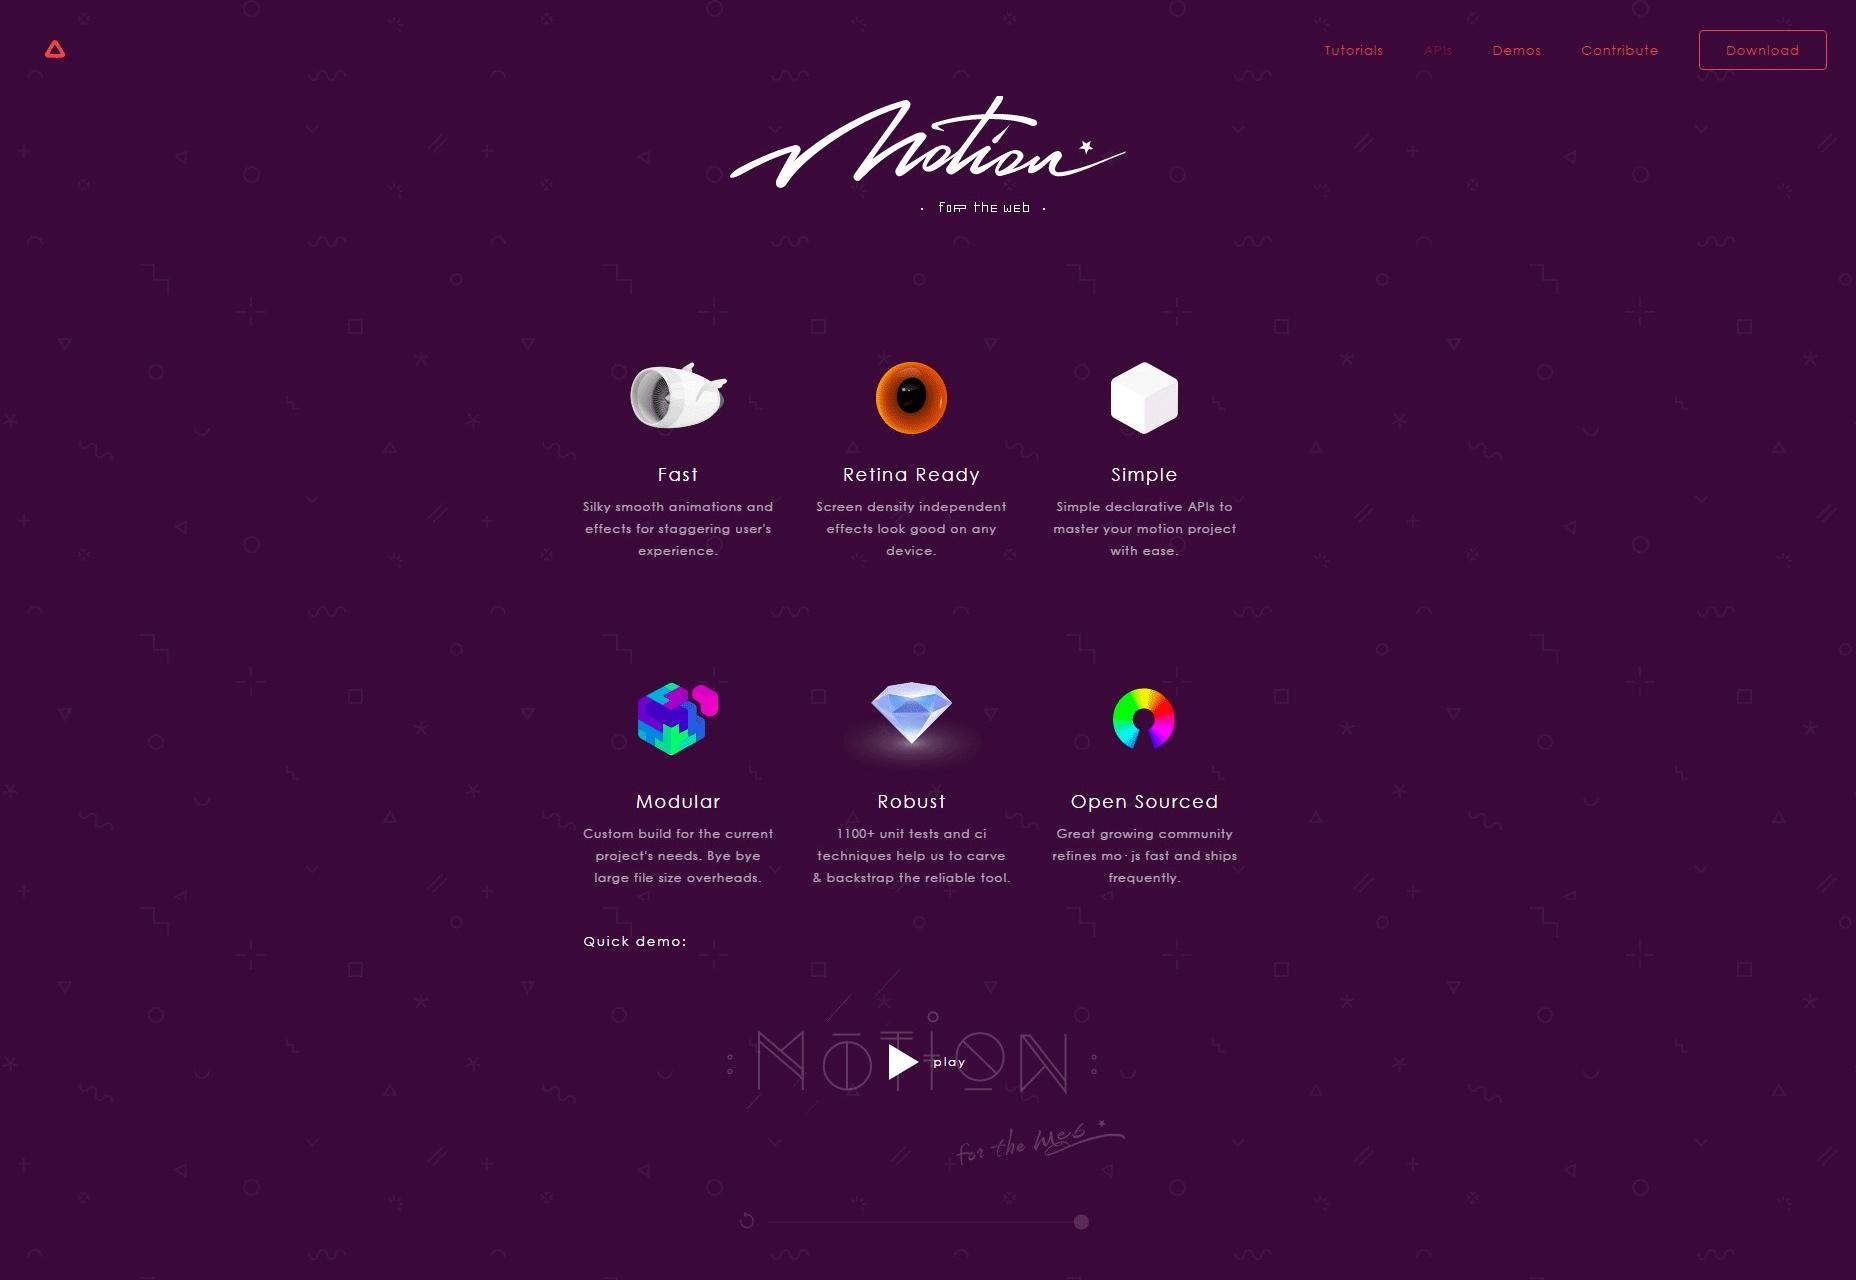 Mo.js: Motion Graphics para la Web